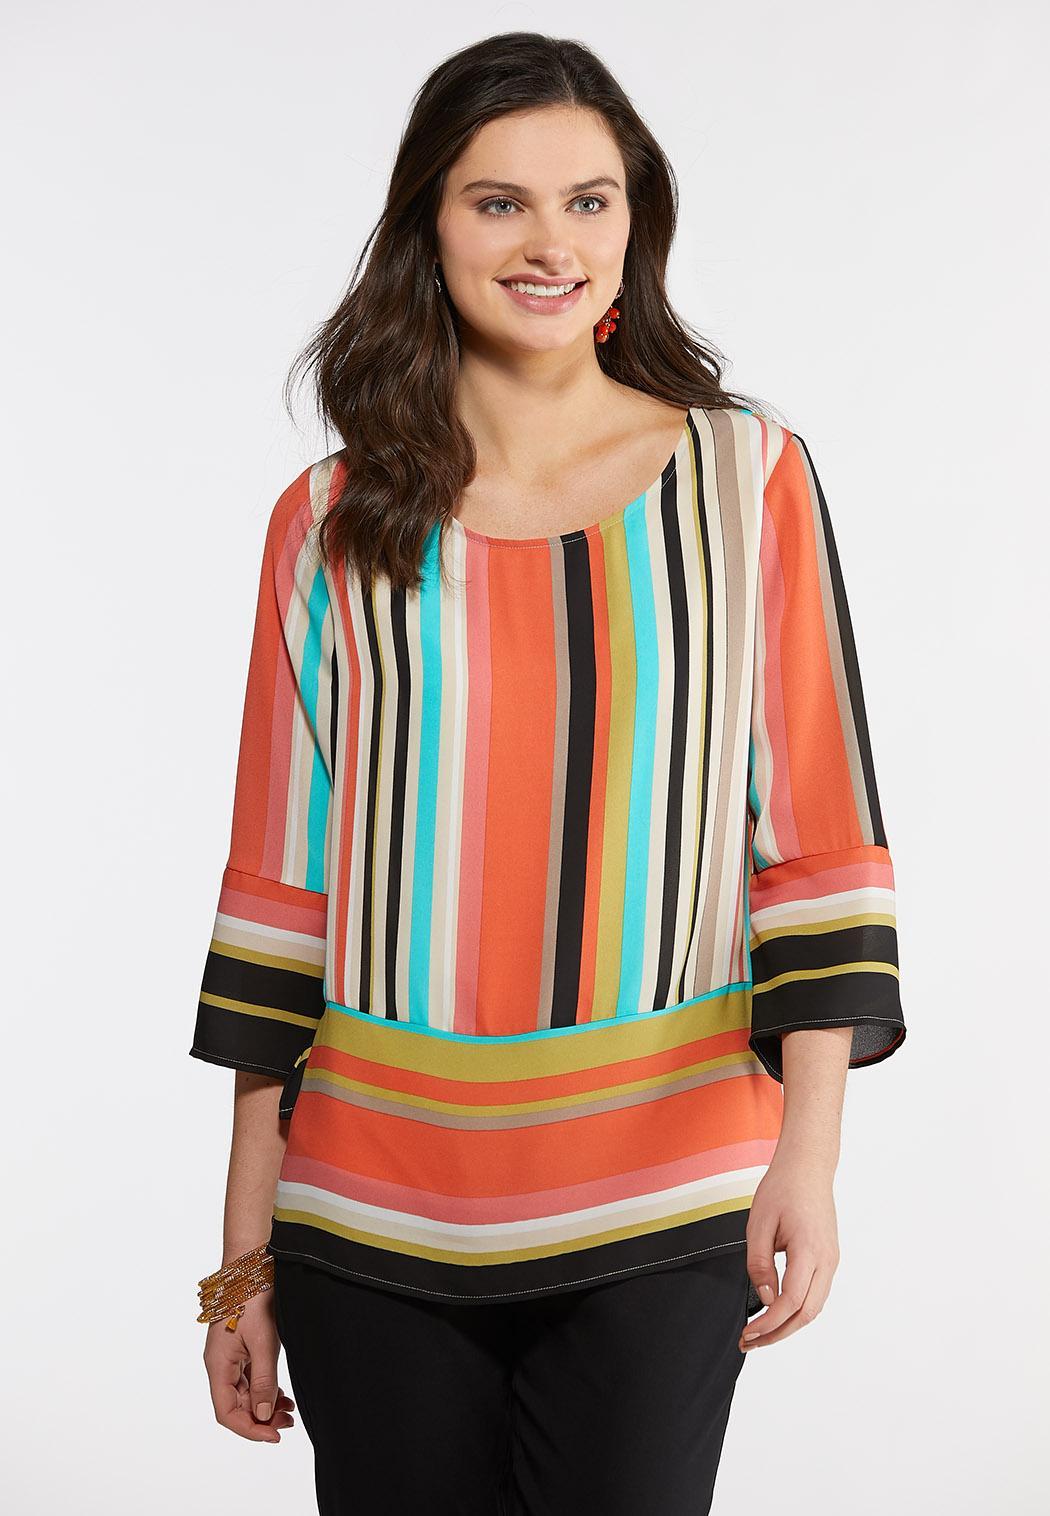 Colorful Stripe Pullover Top